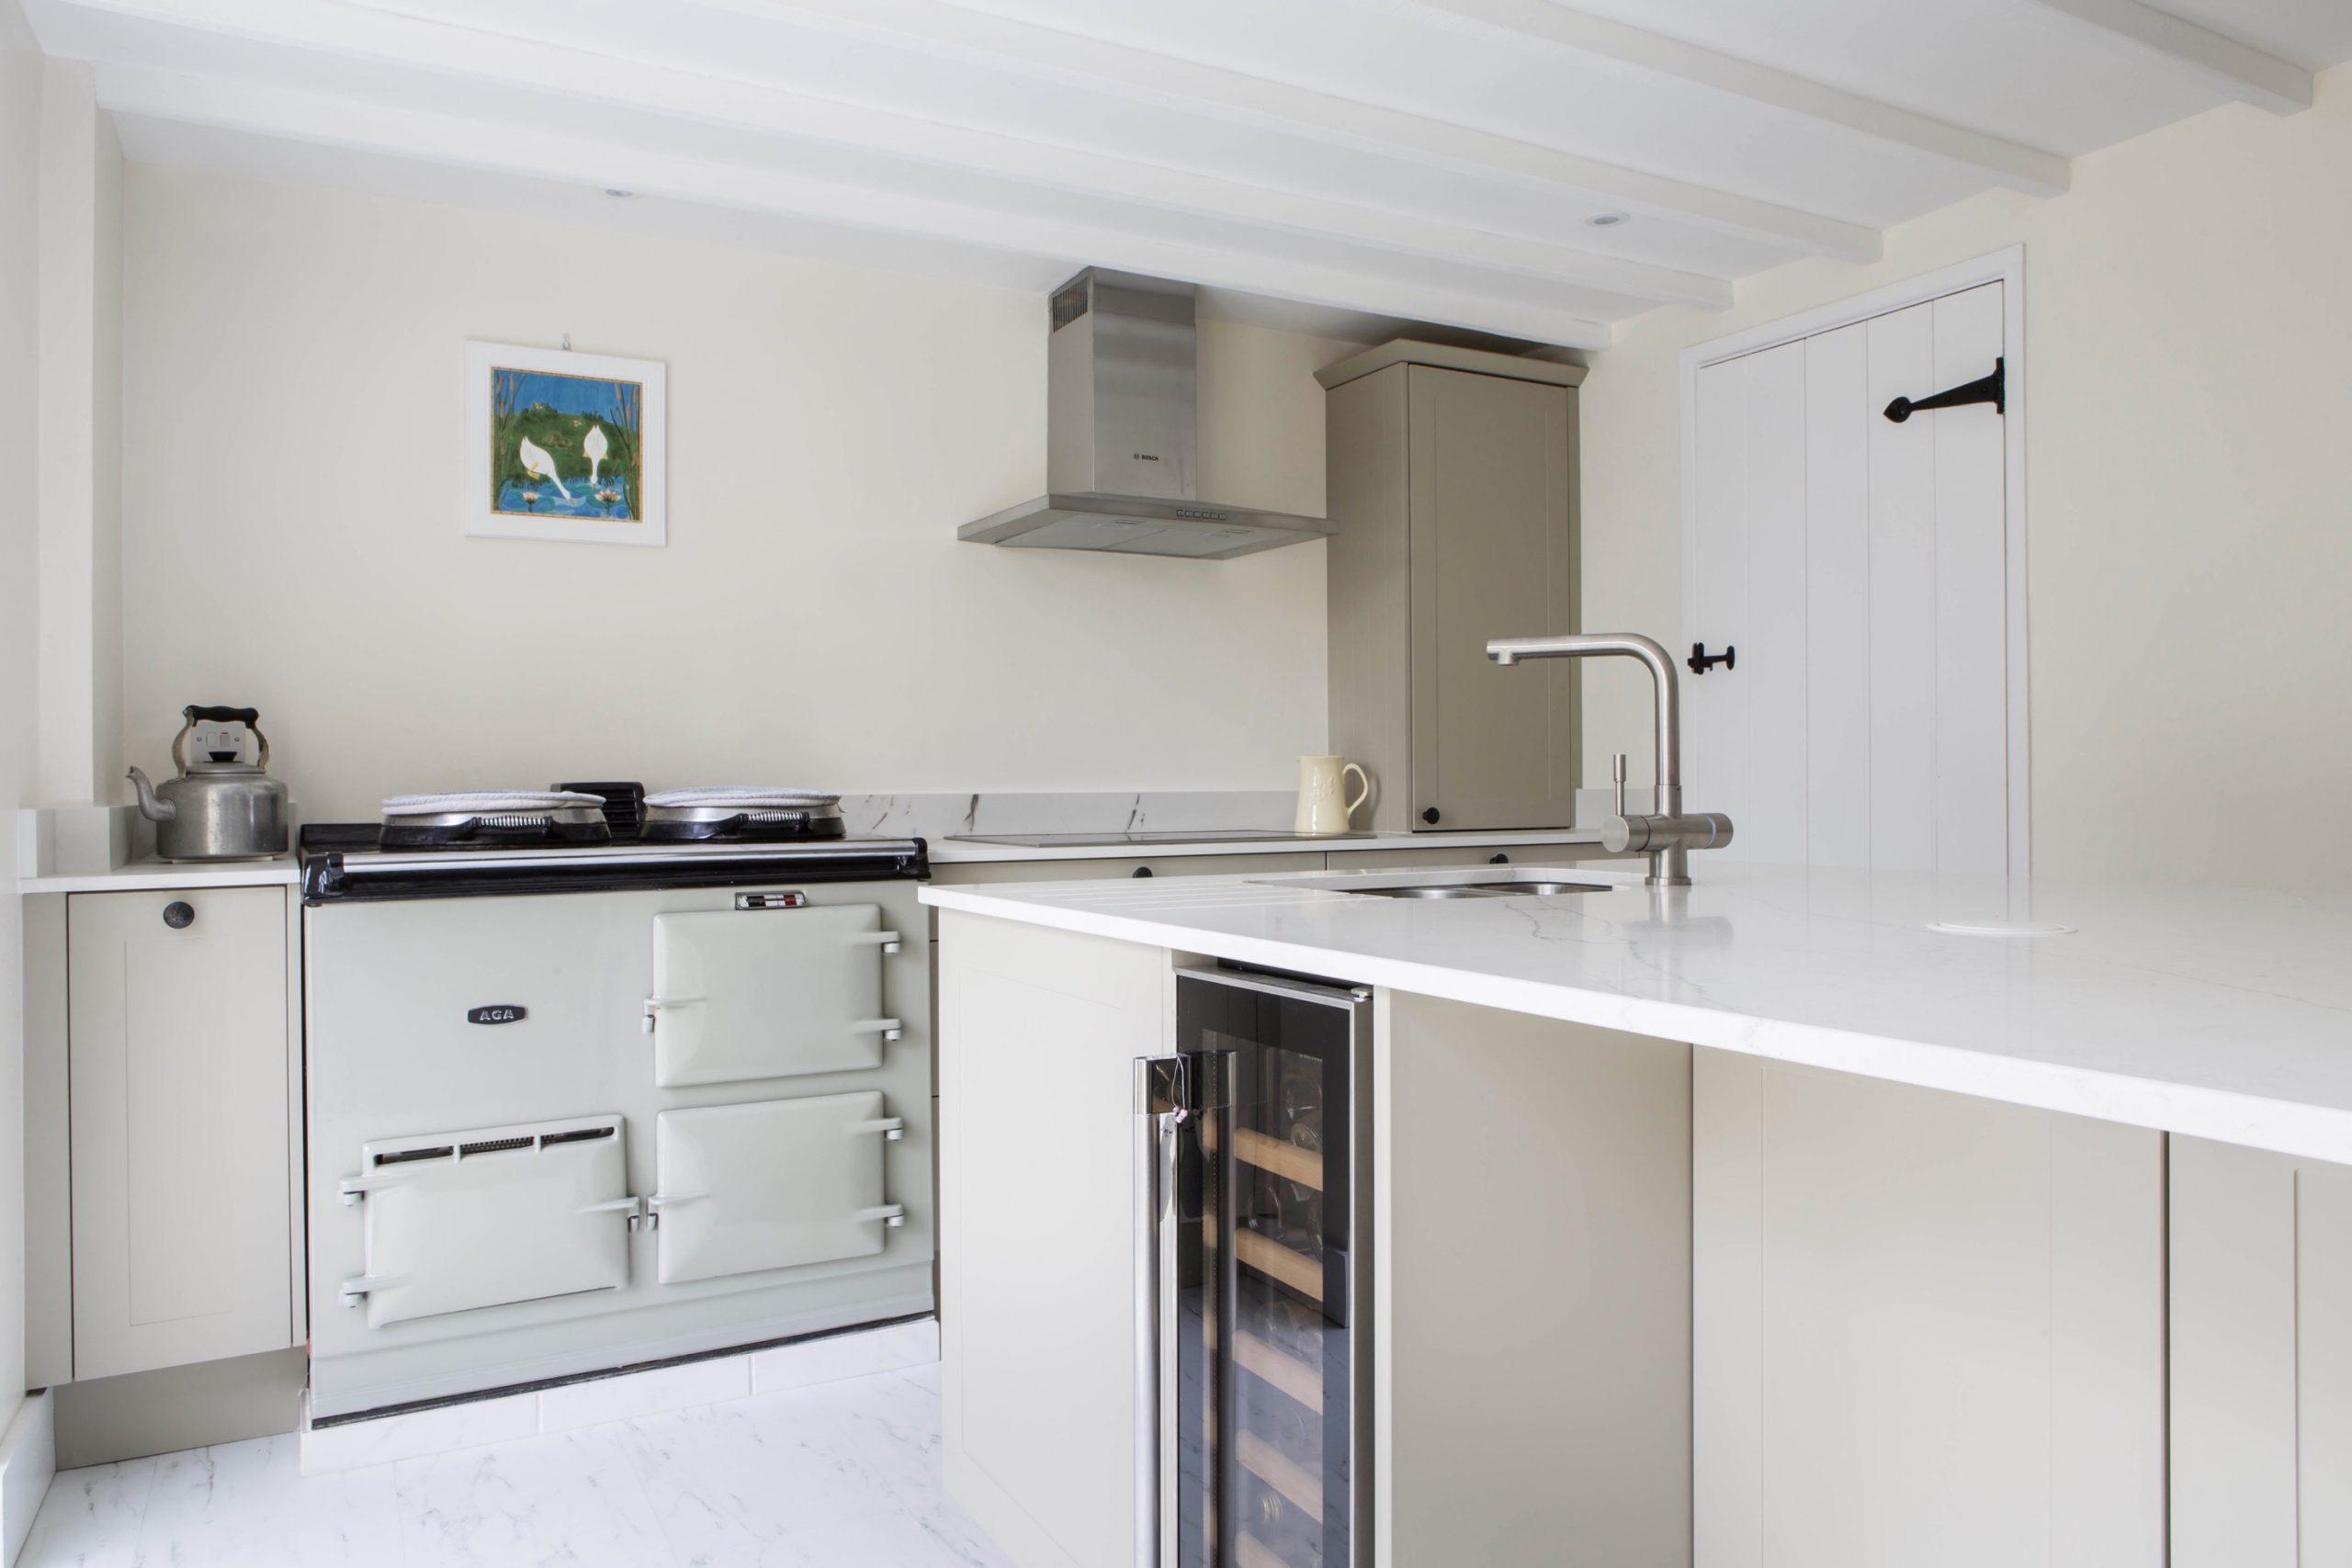 Aga range cooker white quartz breakffast bar kitchen island worminghall buckinghamshire 1 scaled